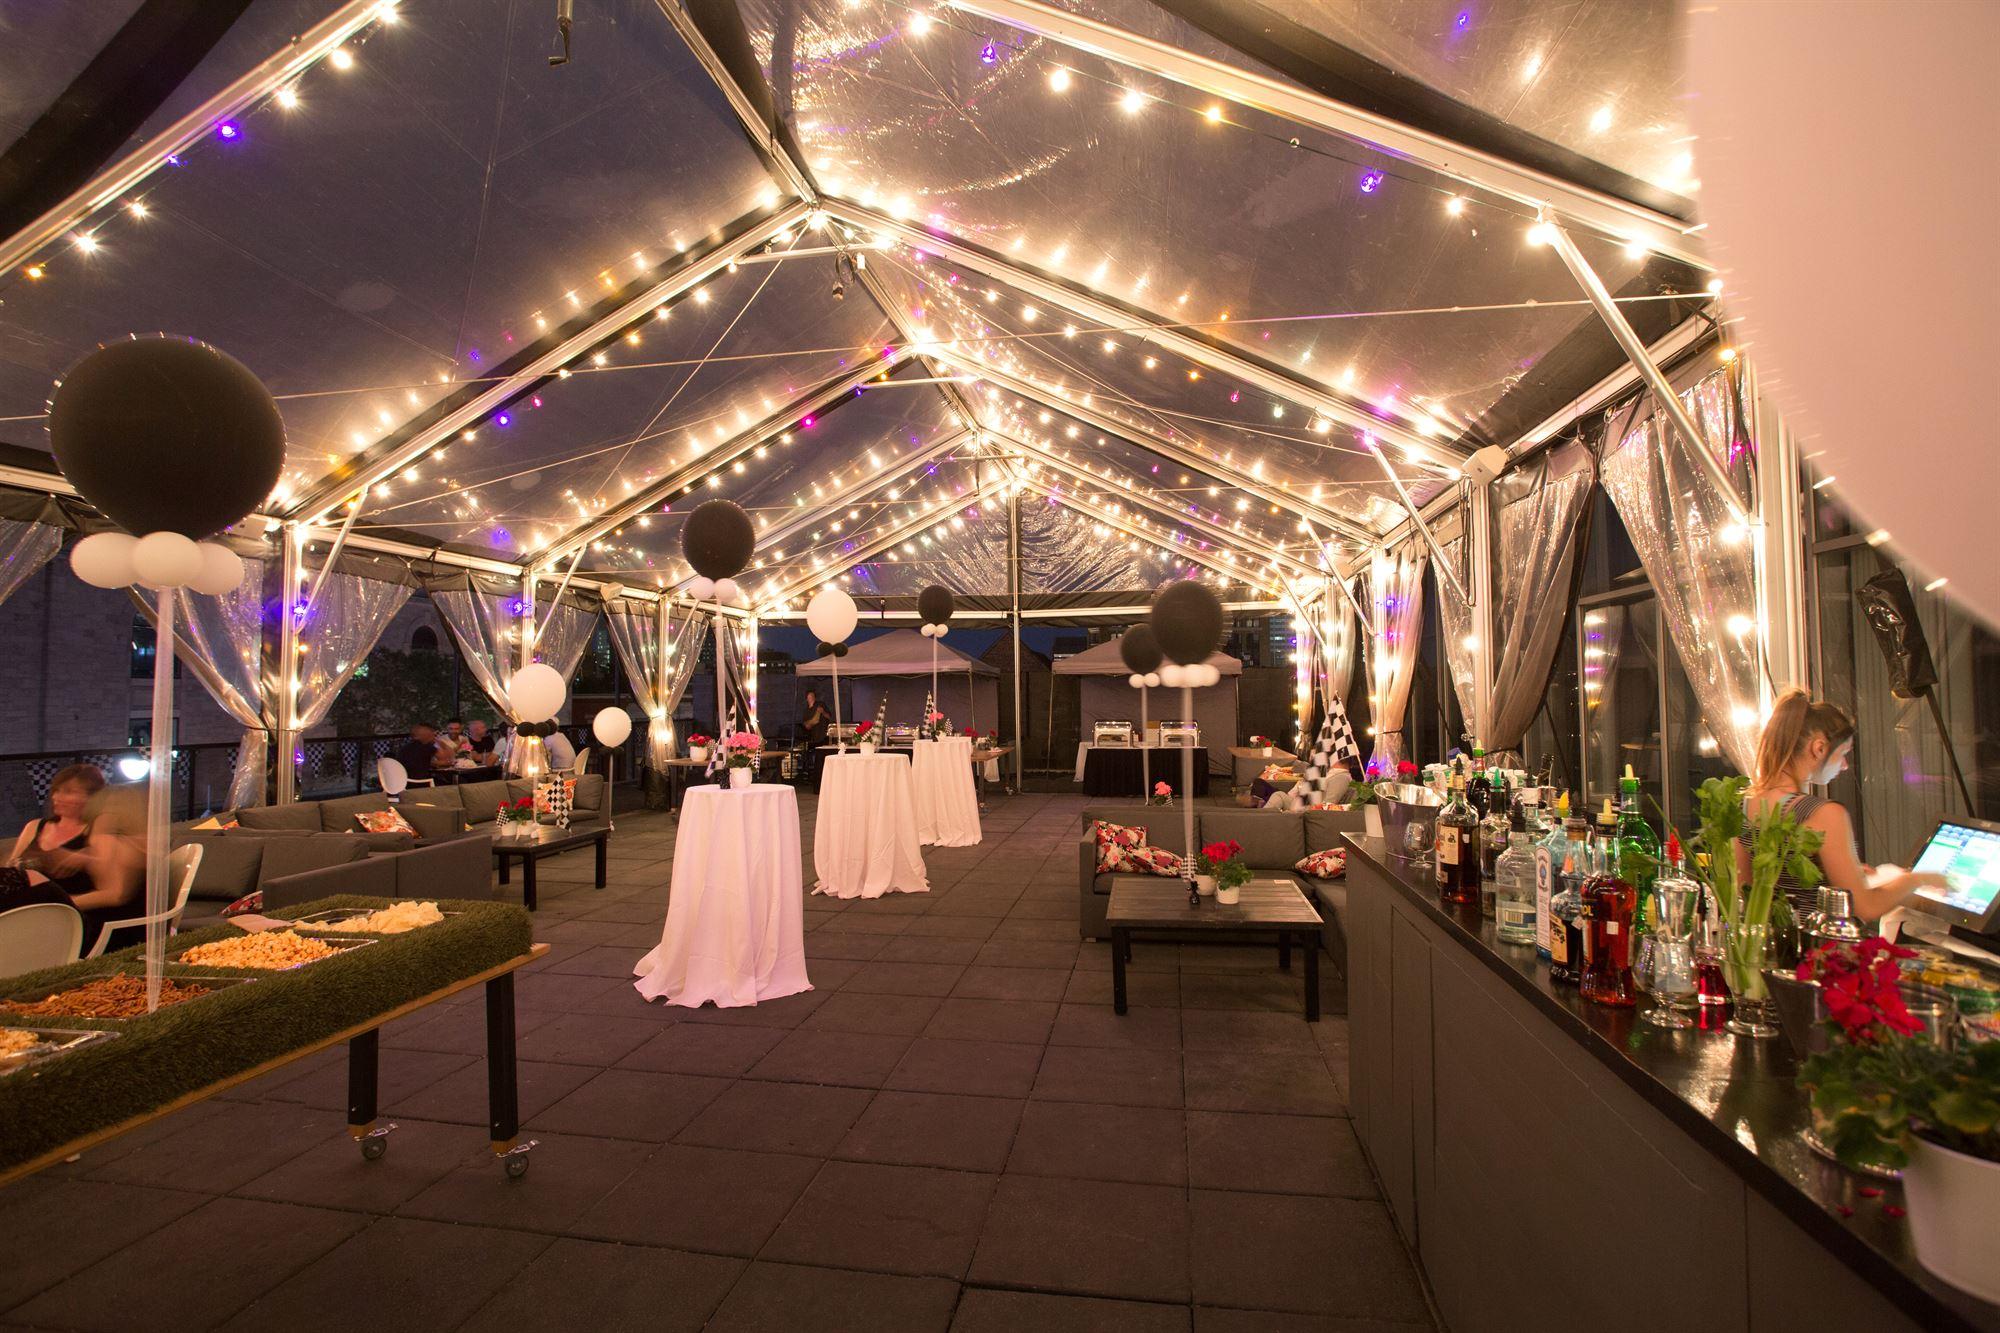 Hotel 10 Terrace Evening Event